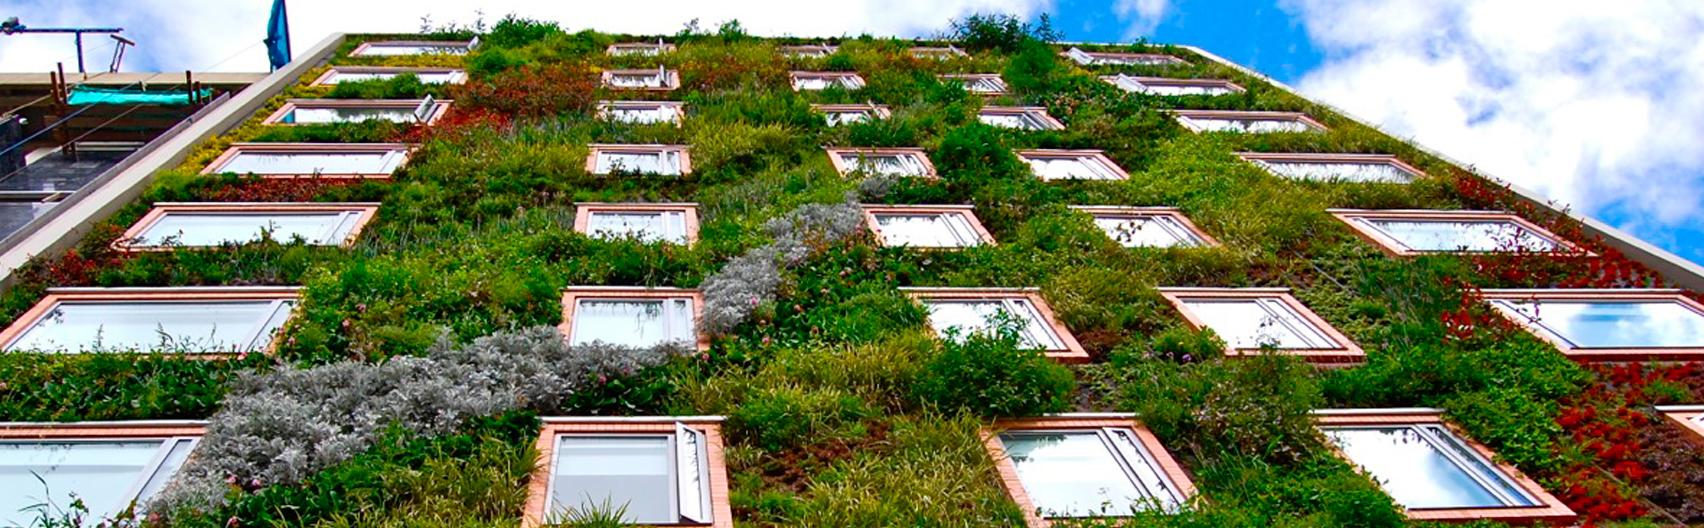 Proyecto jardín vertical Hotel B3- Bogotá. Paisajismo Urbano 2013